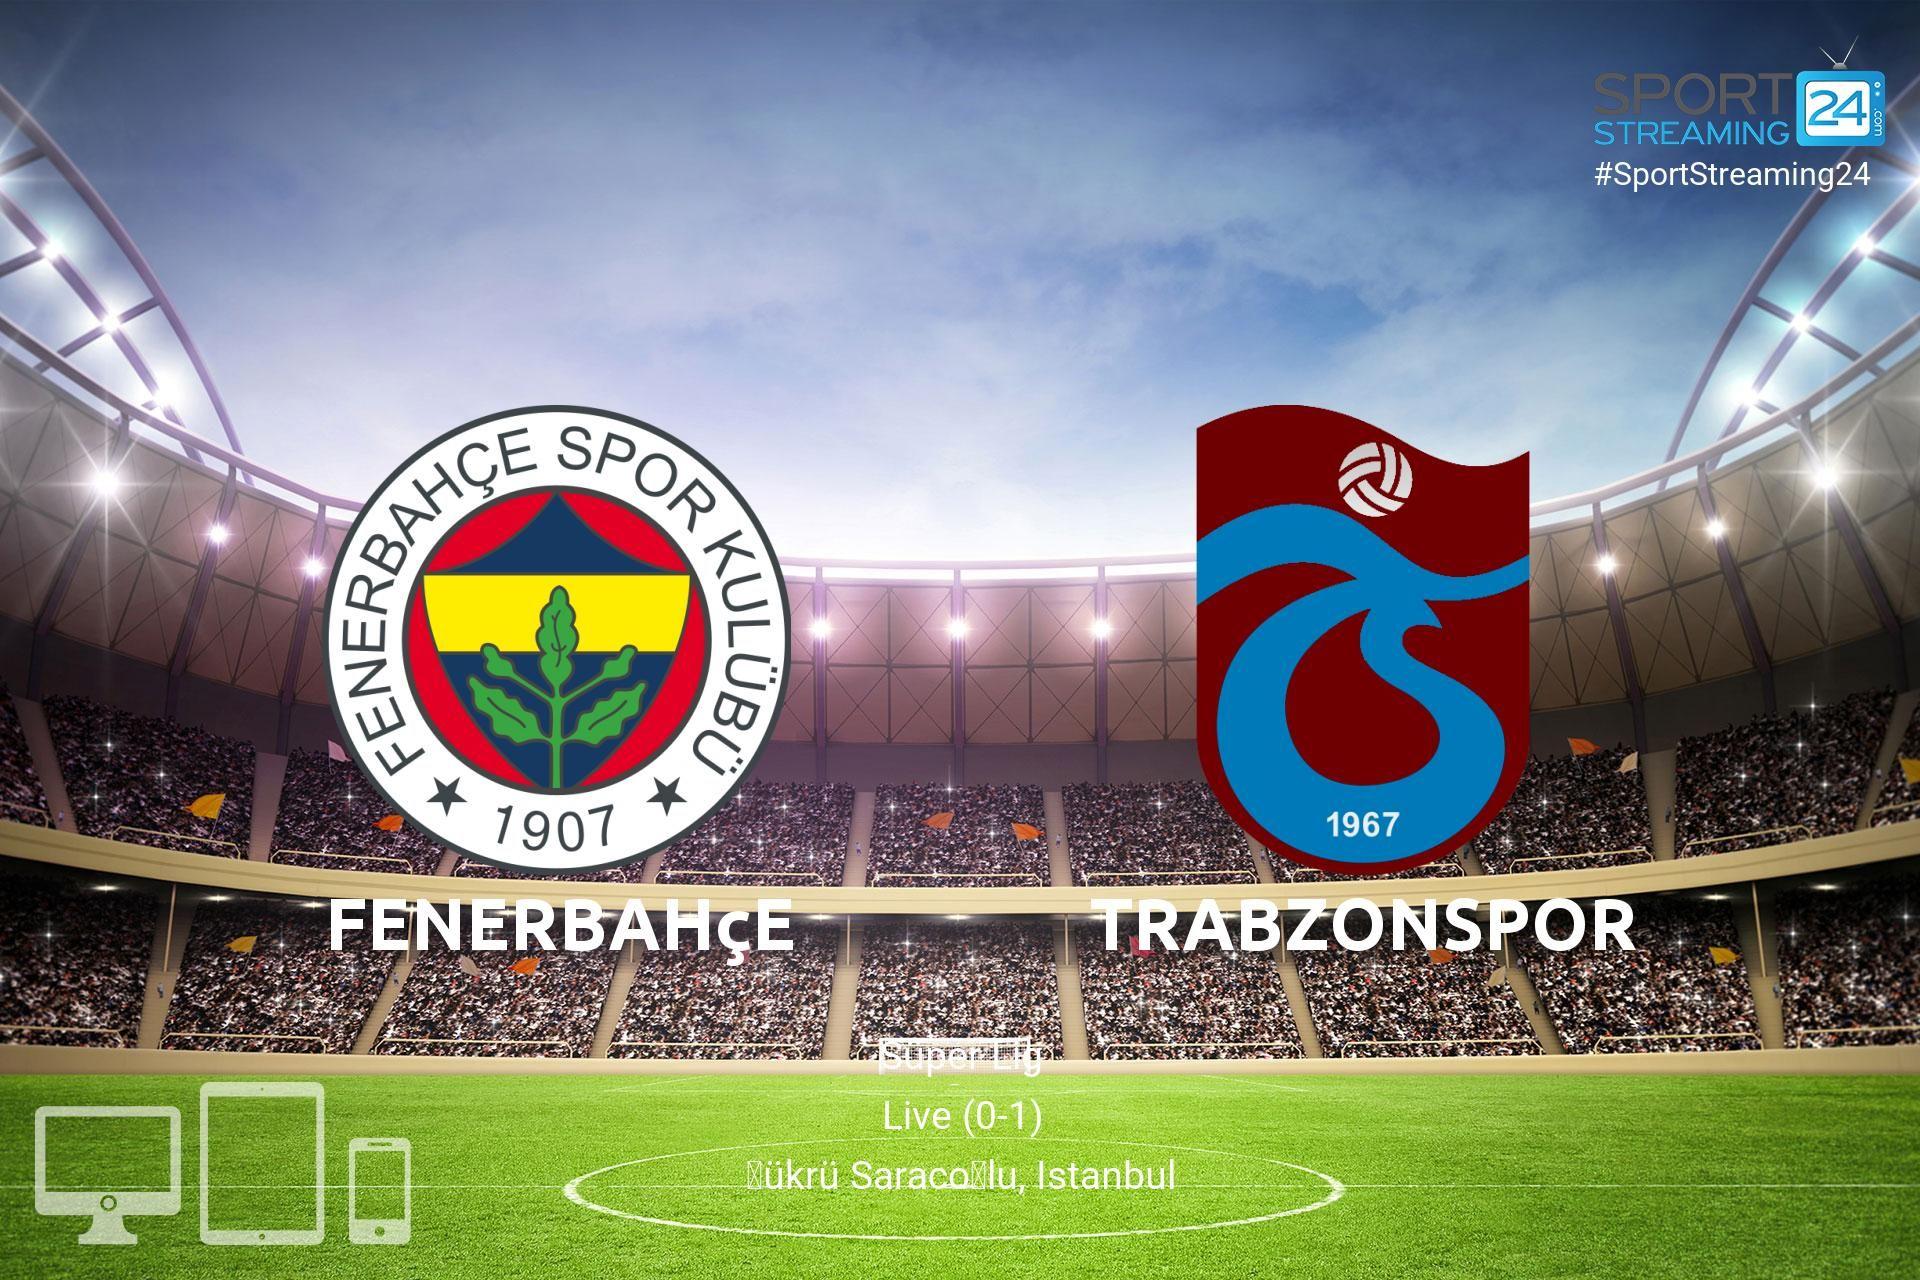 Trabzonspor Fenerbahce Live Stream